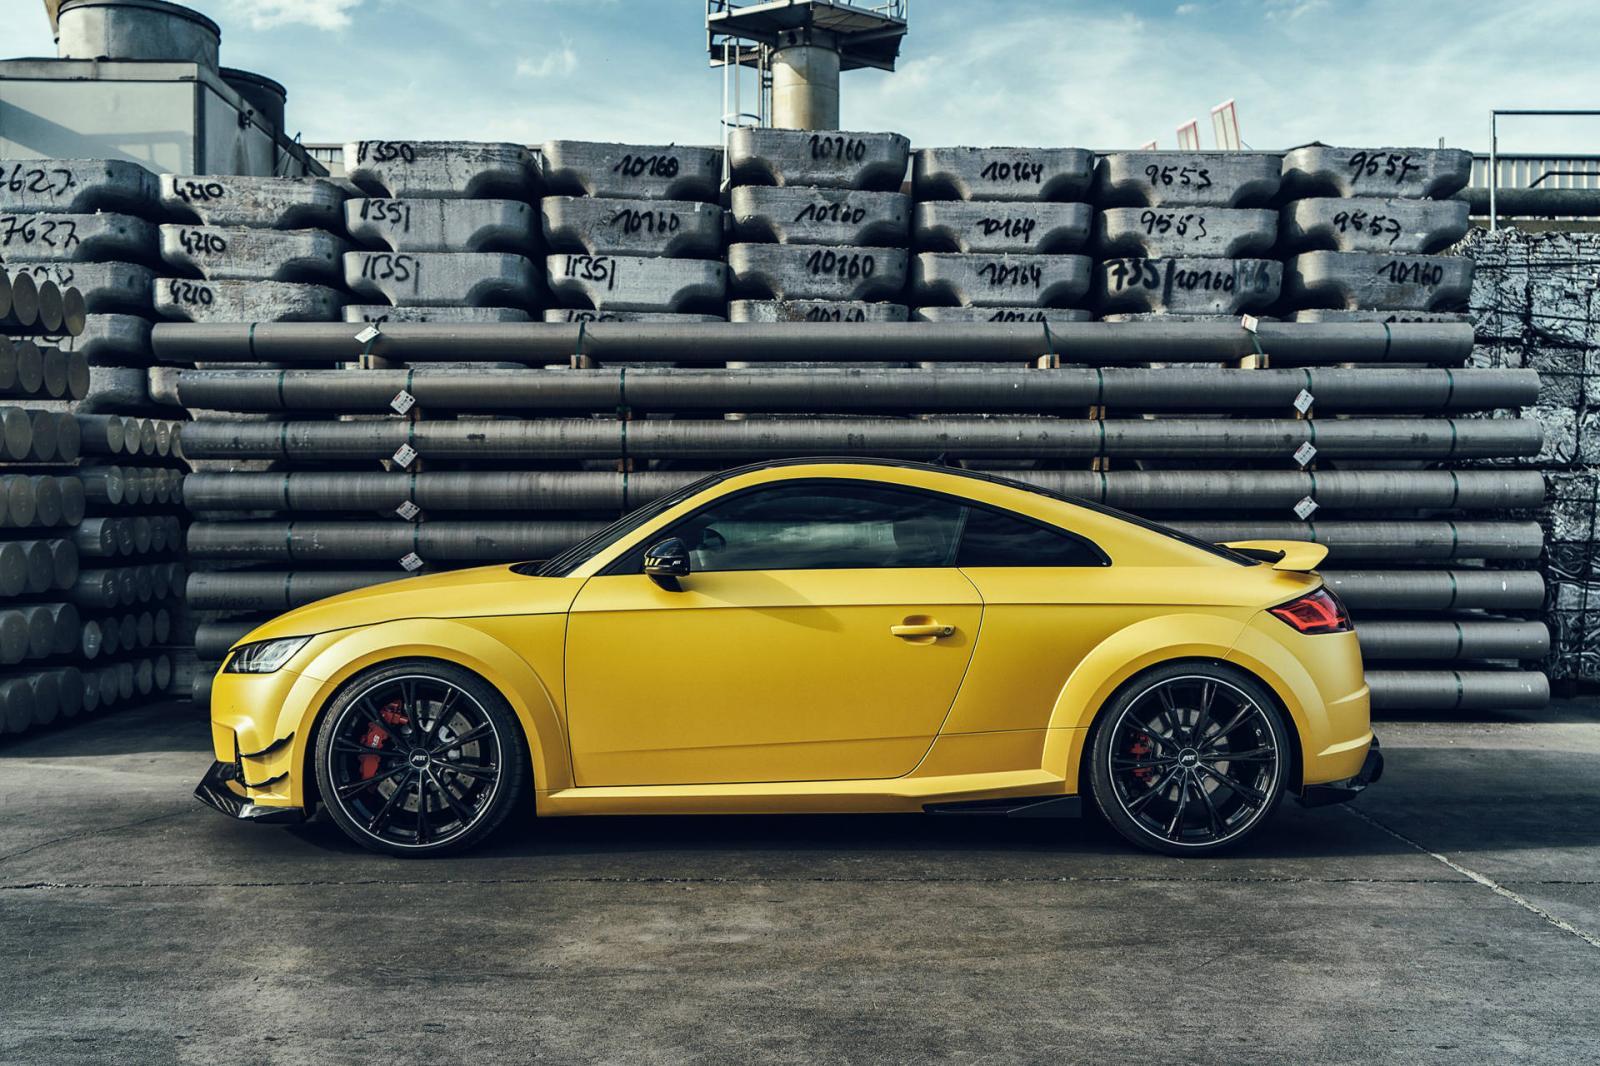 Audi TT RS by Audi